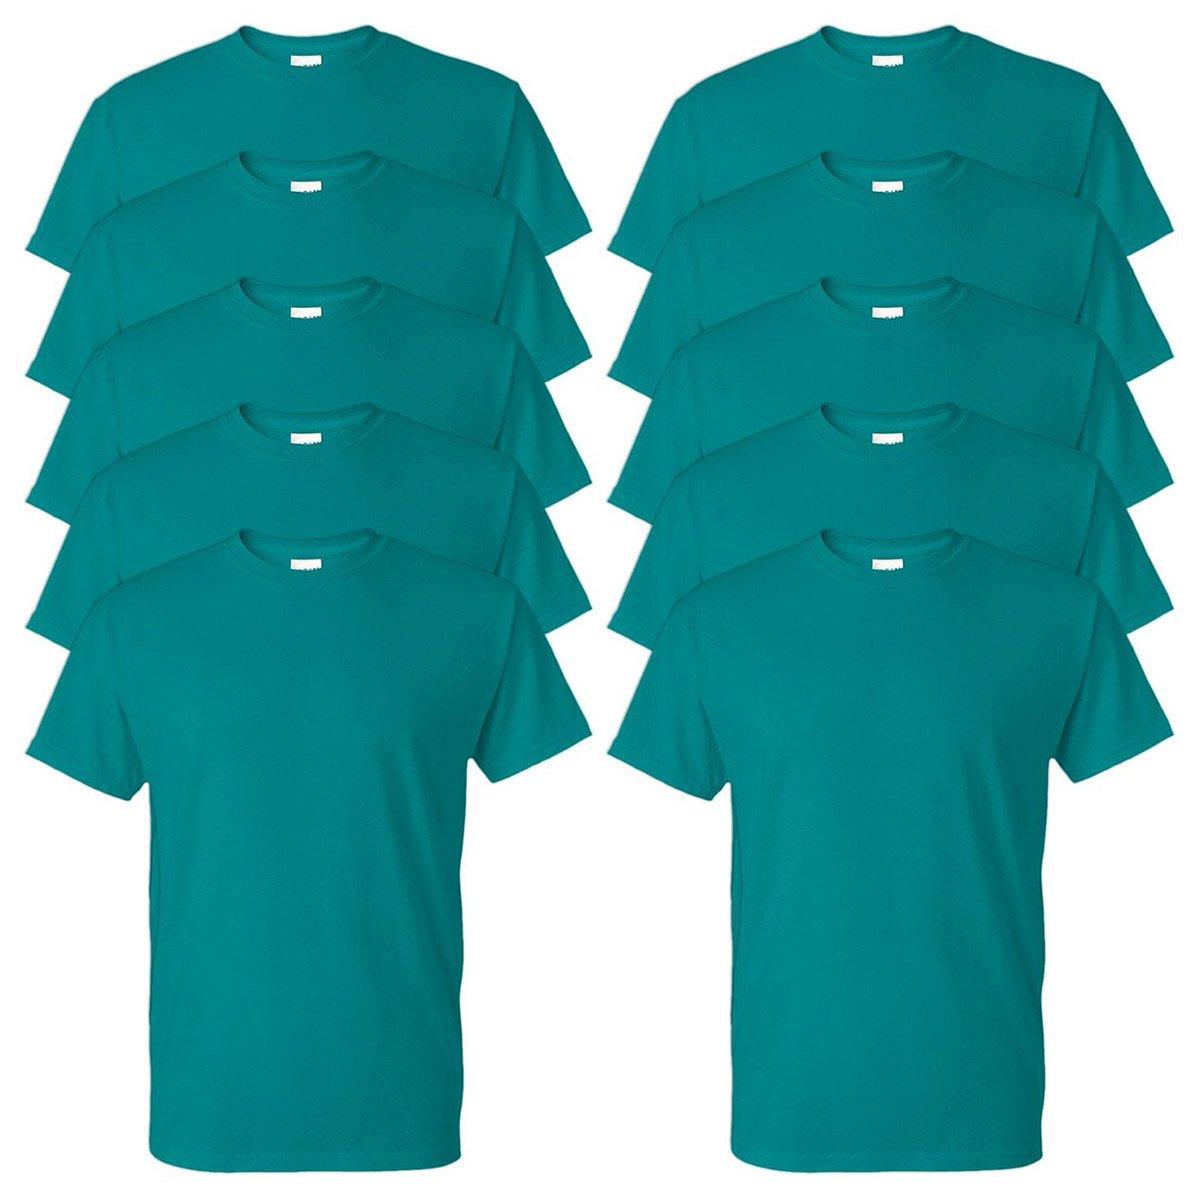 Gildan Adult DryBlend Sports T-Shirt, Jade Dome, 4XL (Pack of 10)